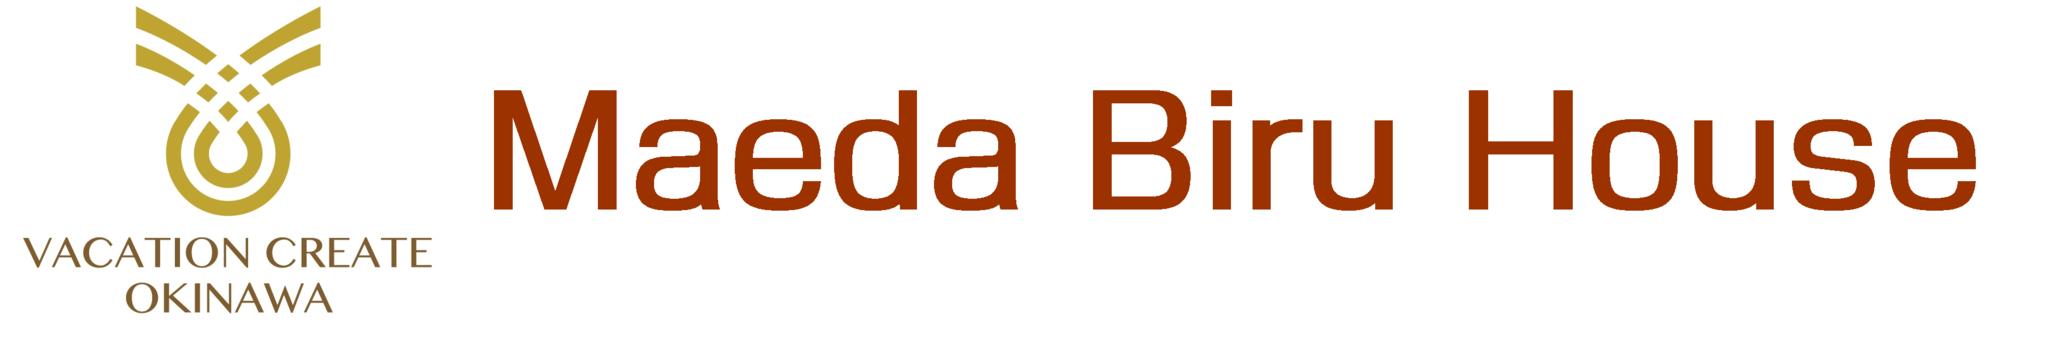 Maeda Biru House